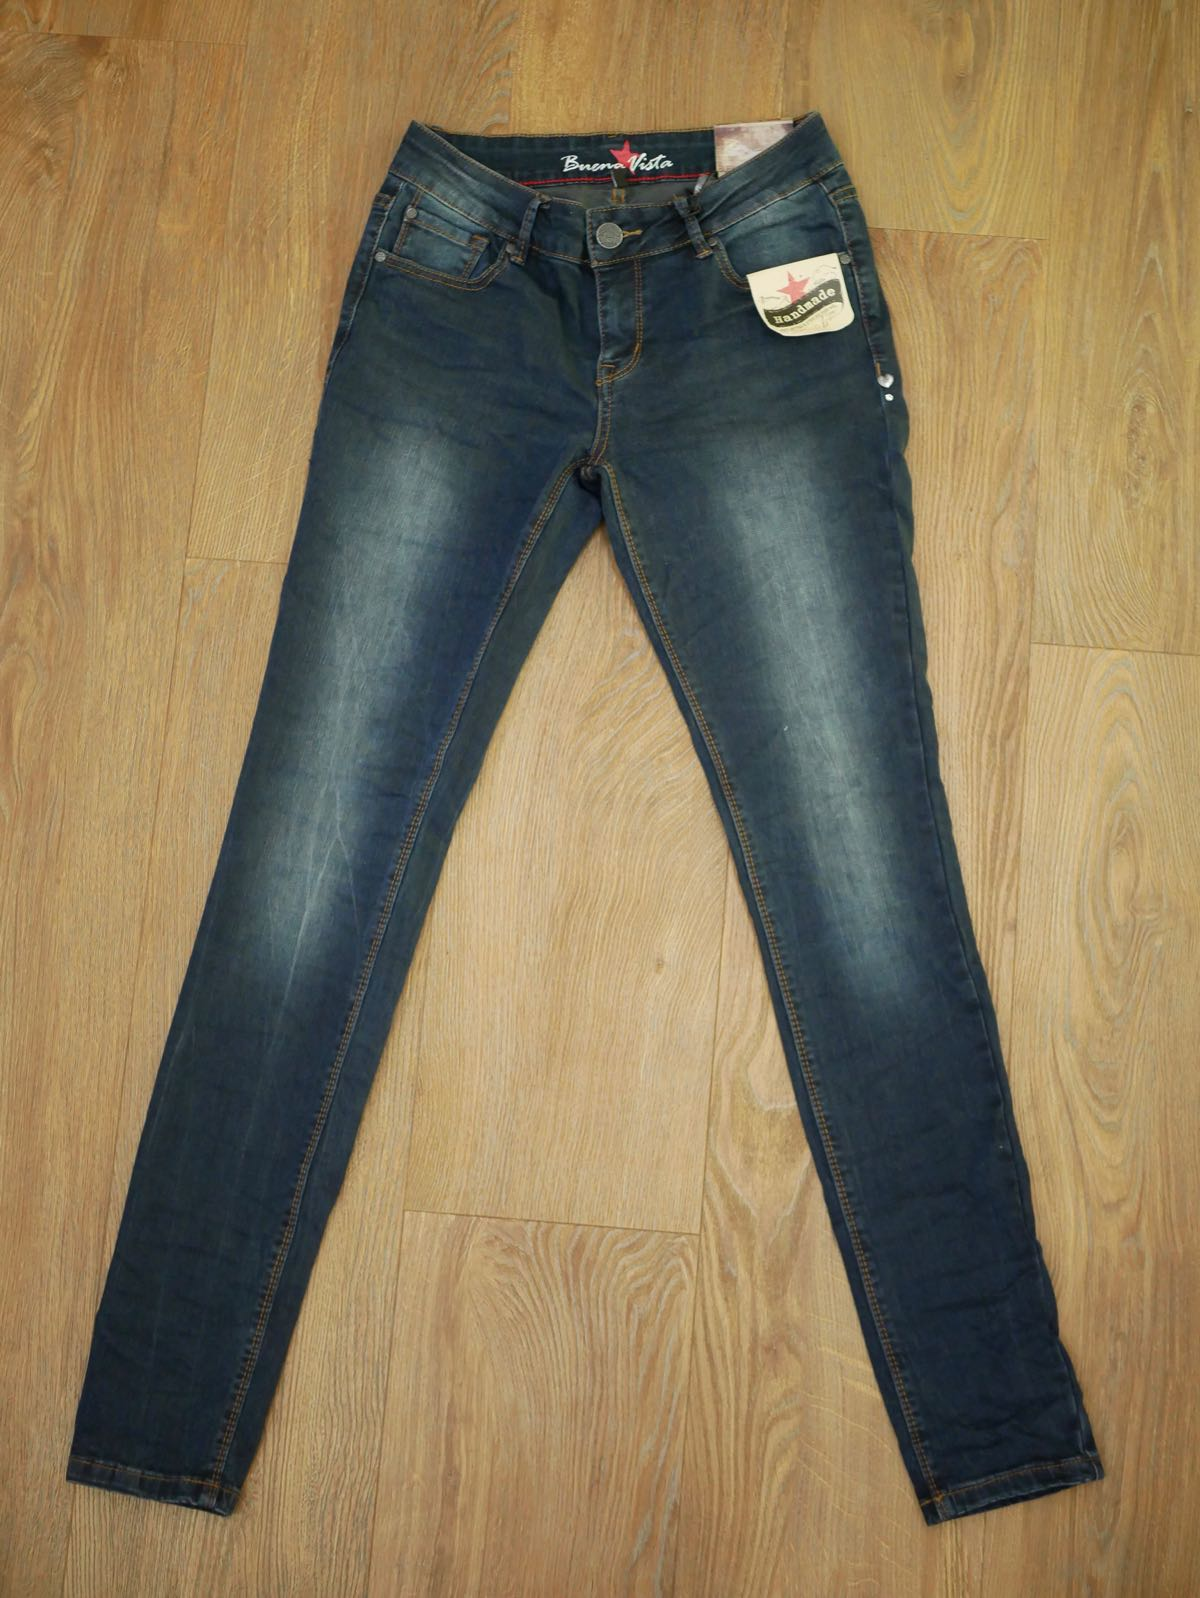 dark blue ** NEU Stretch Denim **  Buena Vista Italy Jeans